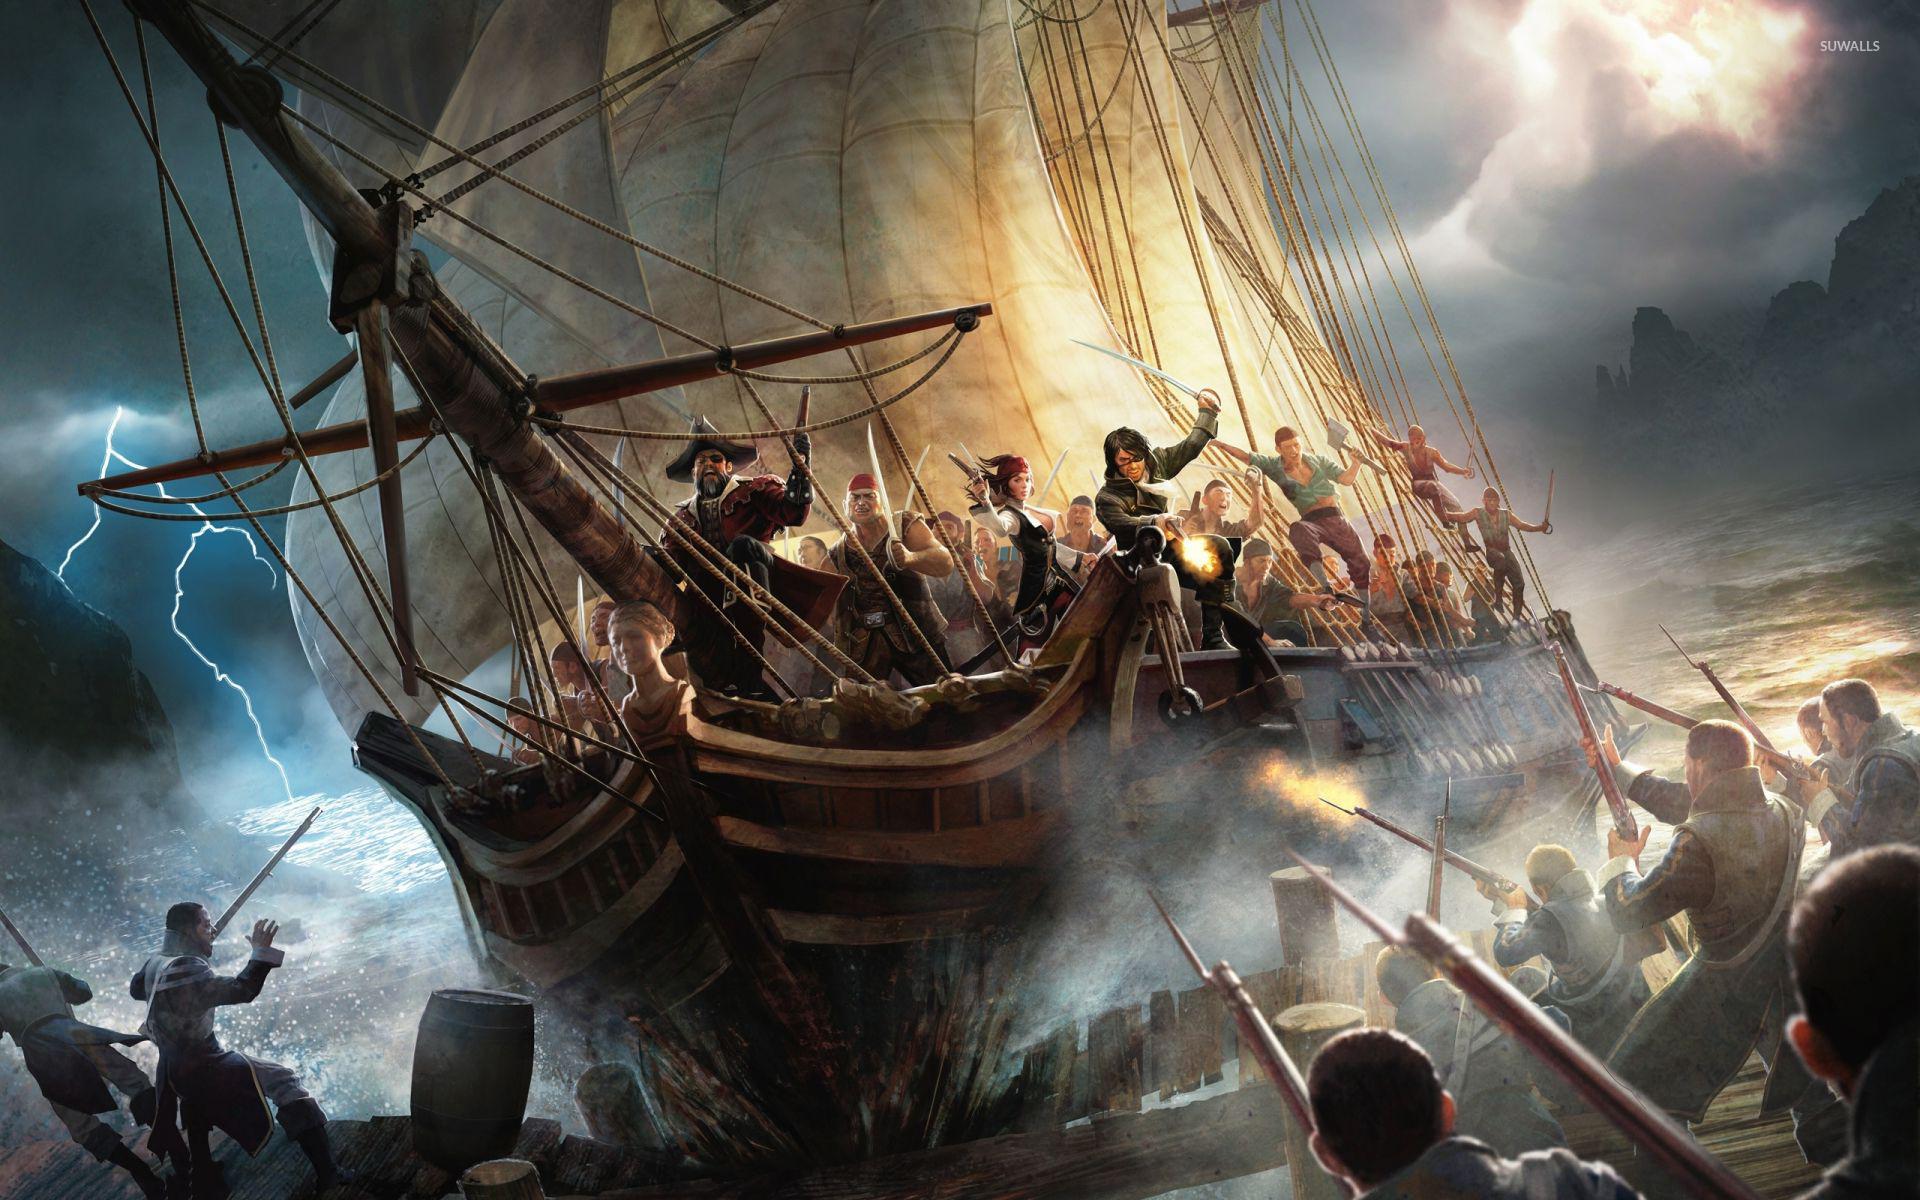 Pirate ship closing to the shore wallpaper - Fantasy